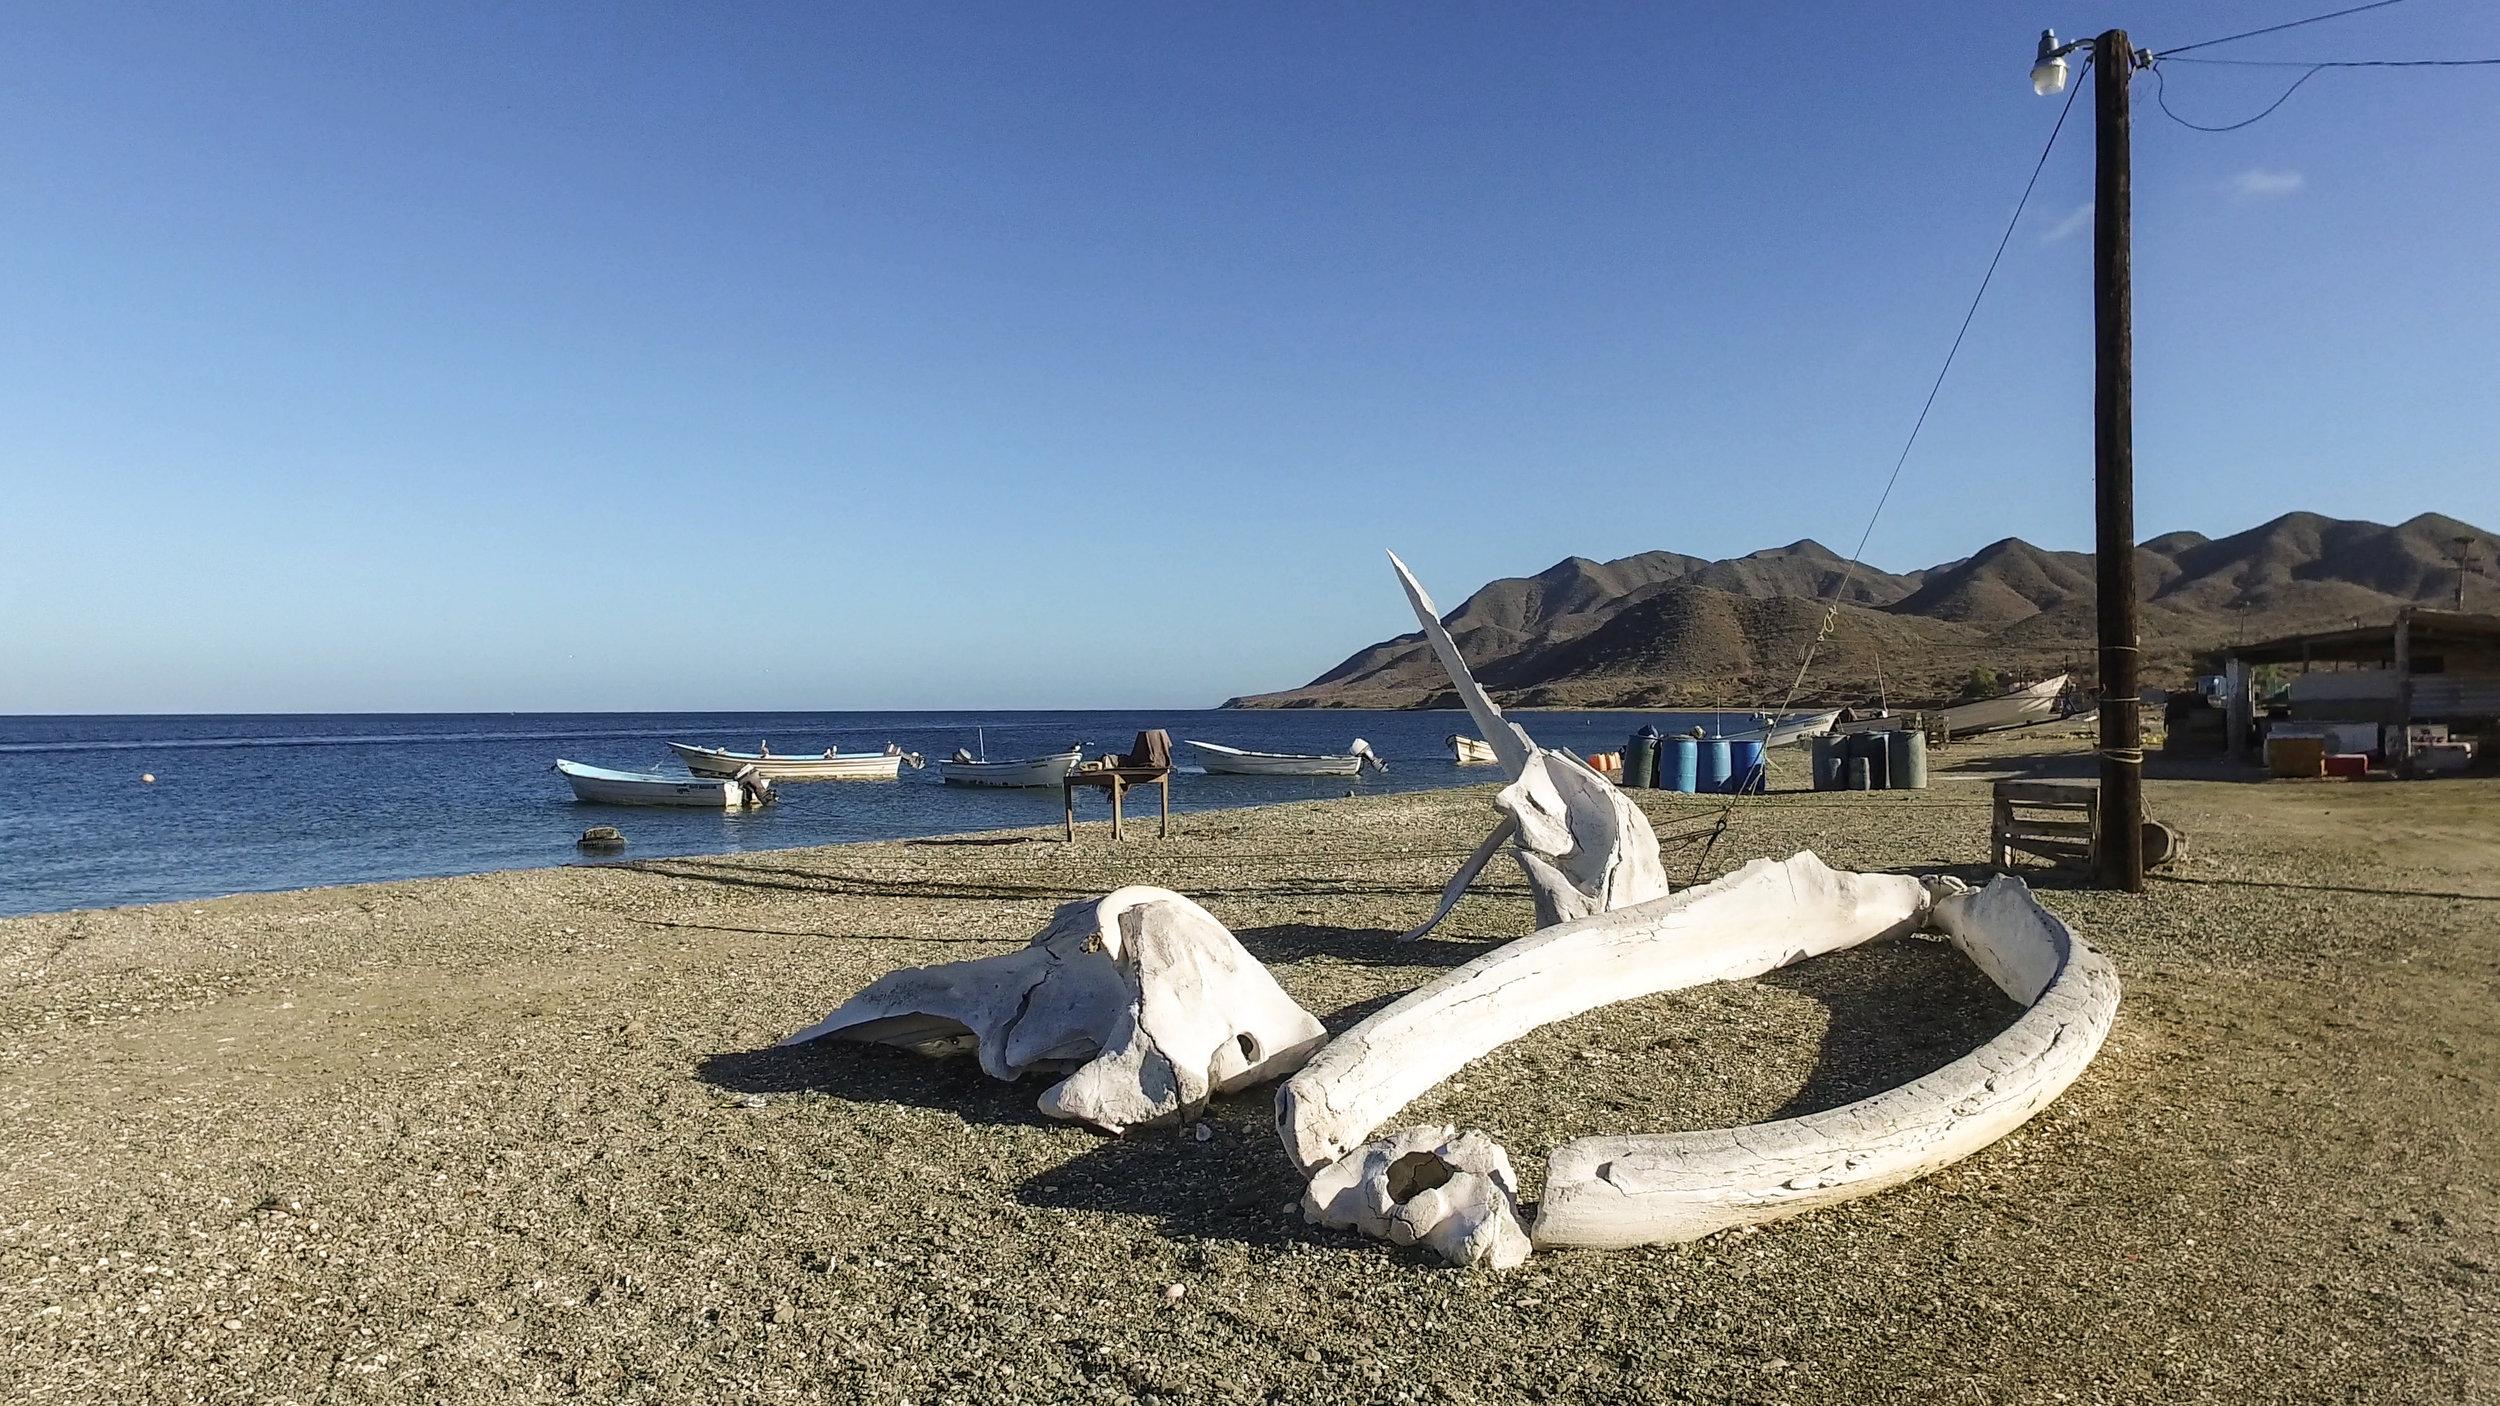 Whale bones piled up on the beach.